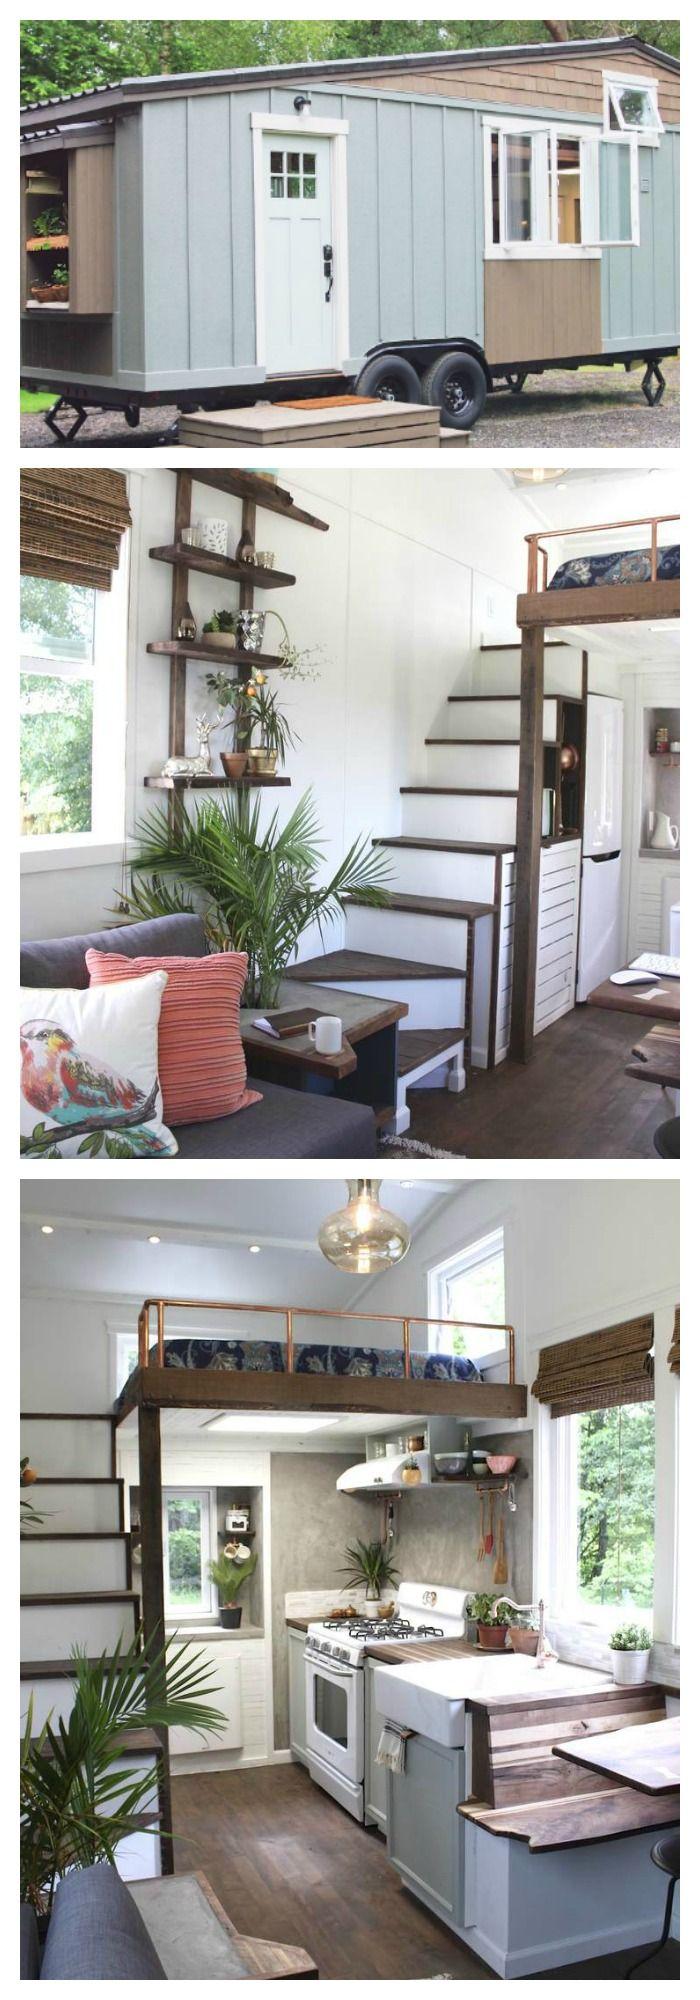 Peek Inside The Cutest Little 250 Square Foot Mobile Farmhouse Tiny House Inspiration Tiny House Nation Tiny House Living